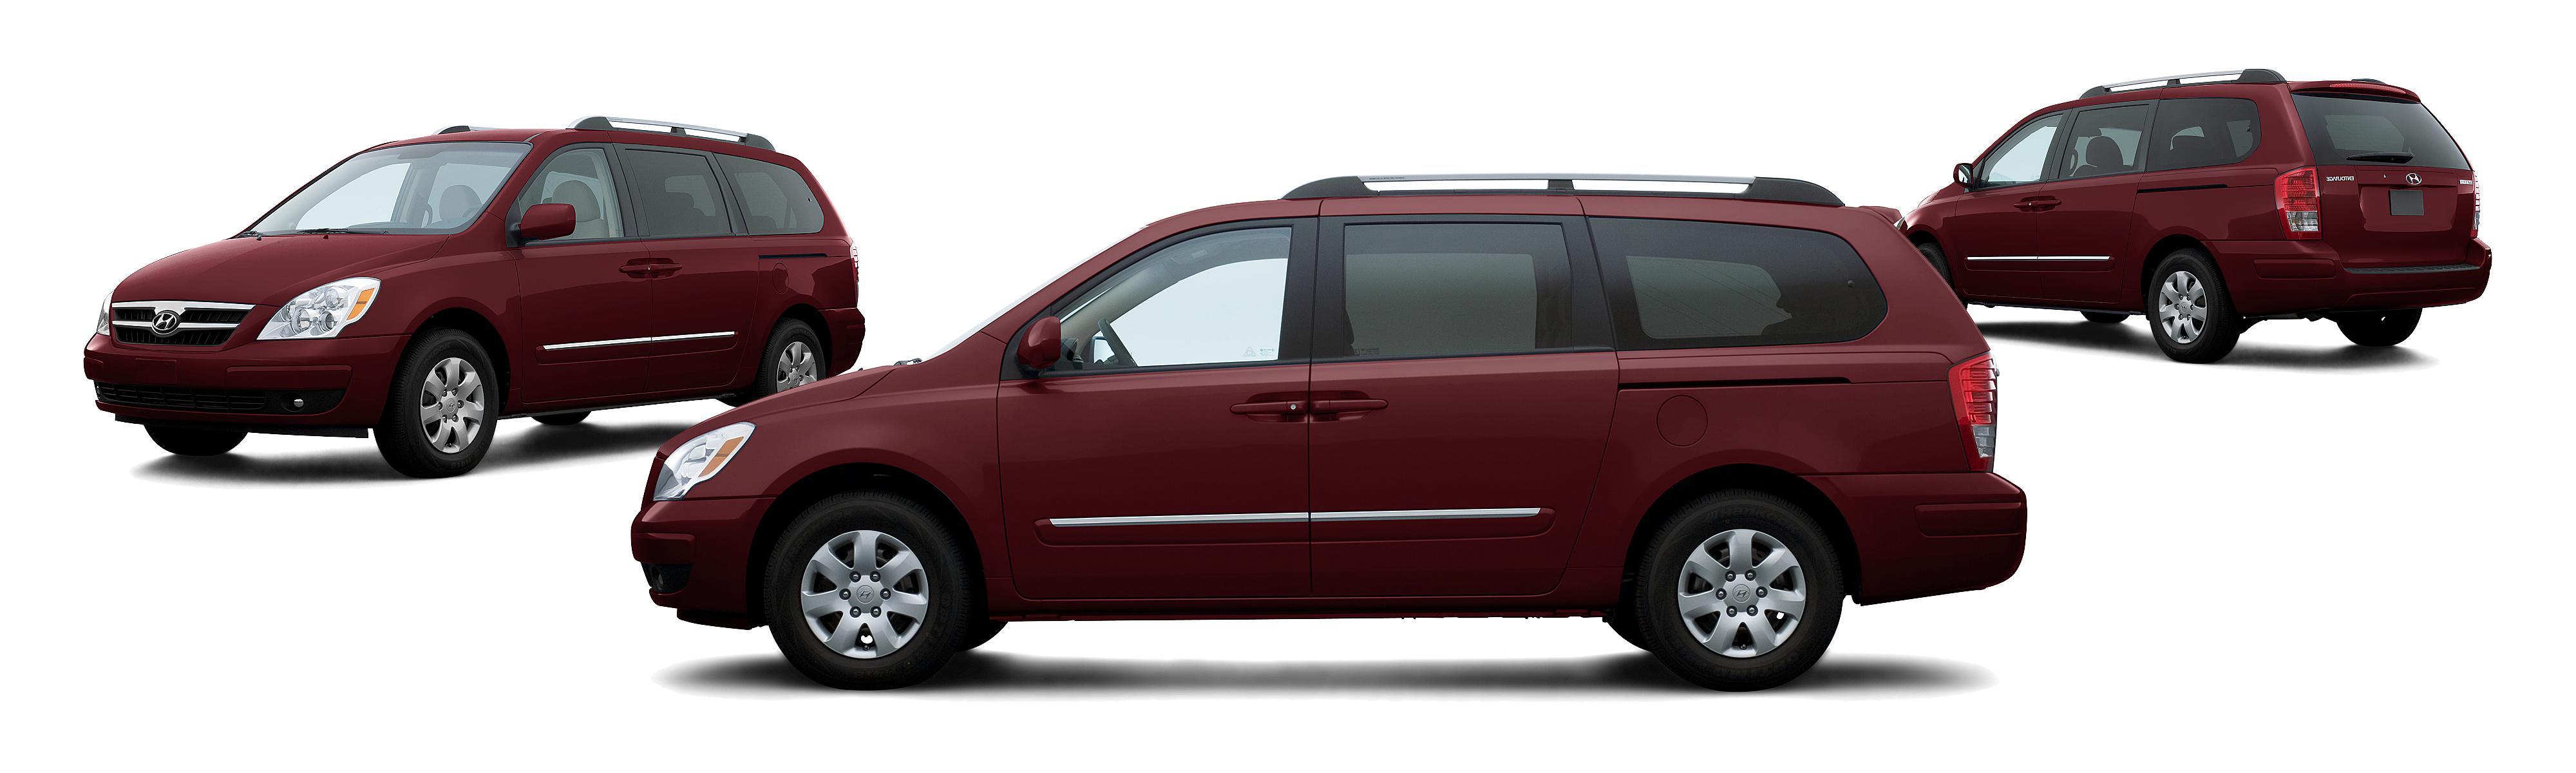 Hyundai Entourage Gls Dr Mini Van Cranberry Red Composite Large on 2007 Hyundai Elantra Fuse Label